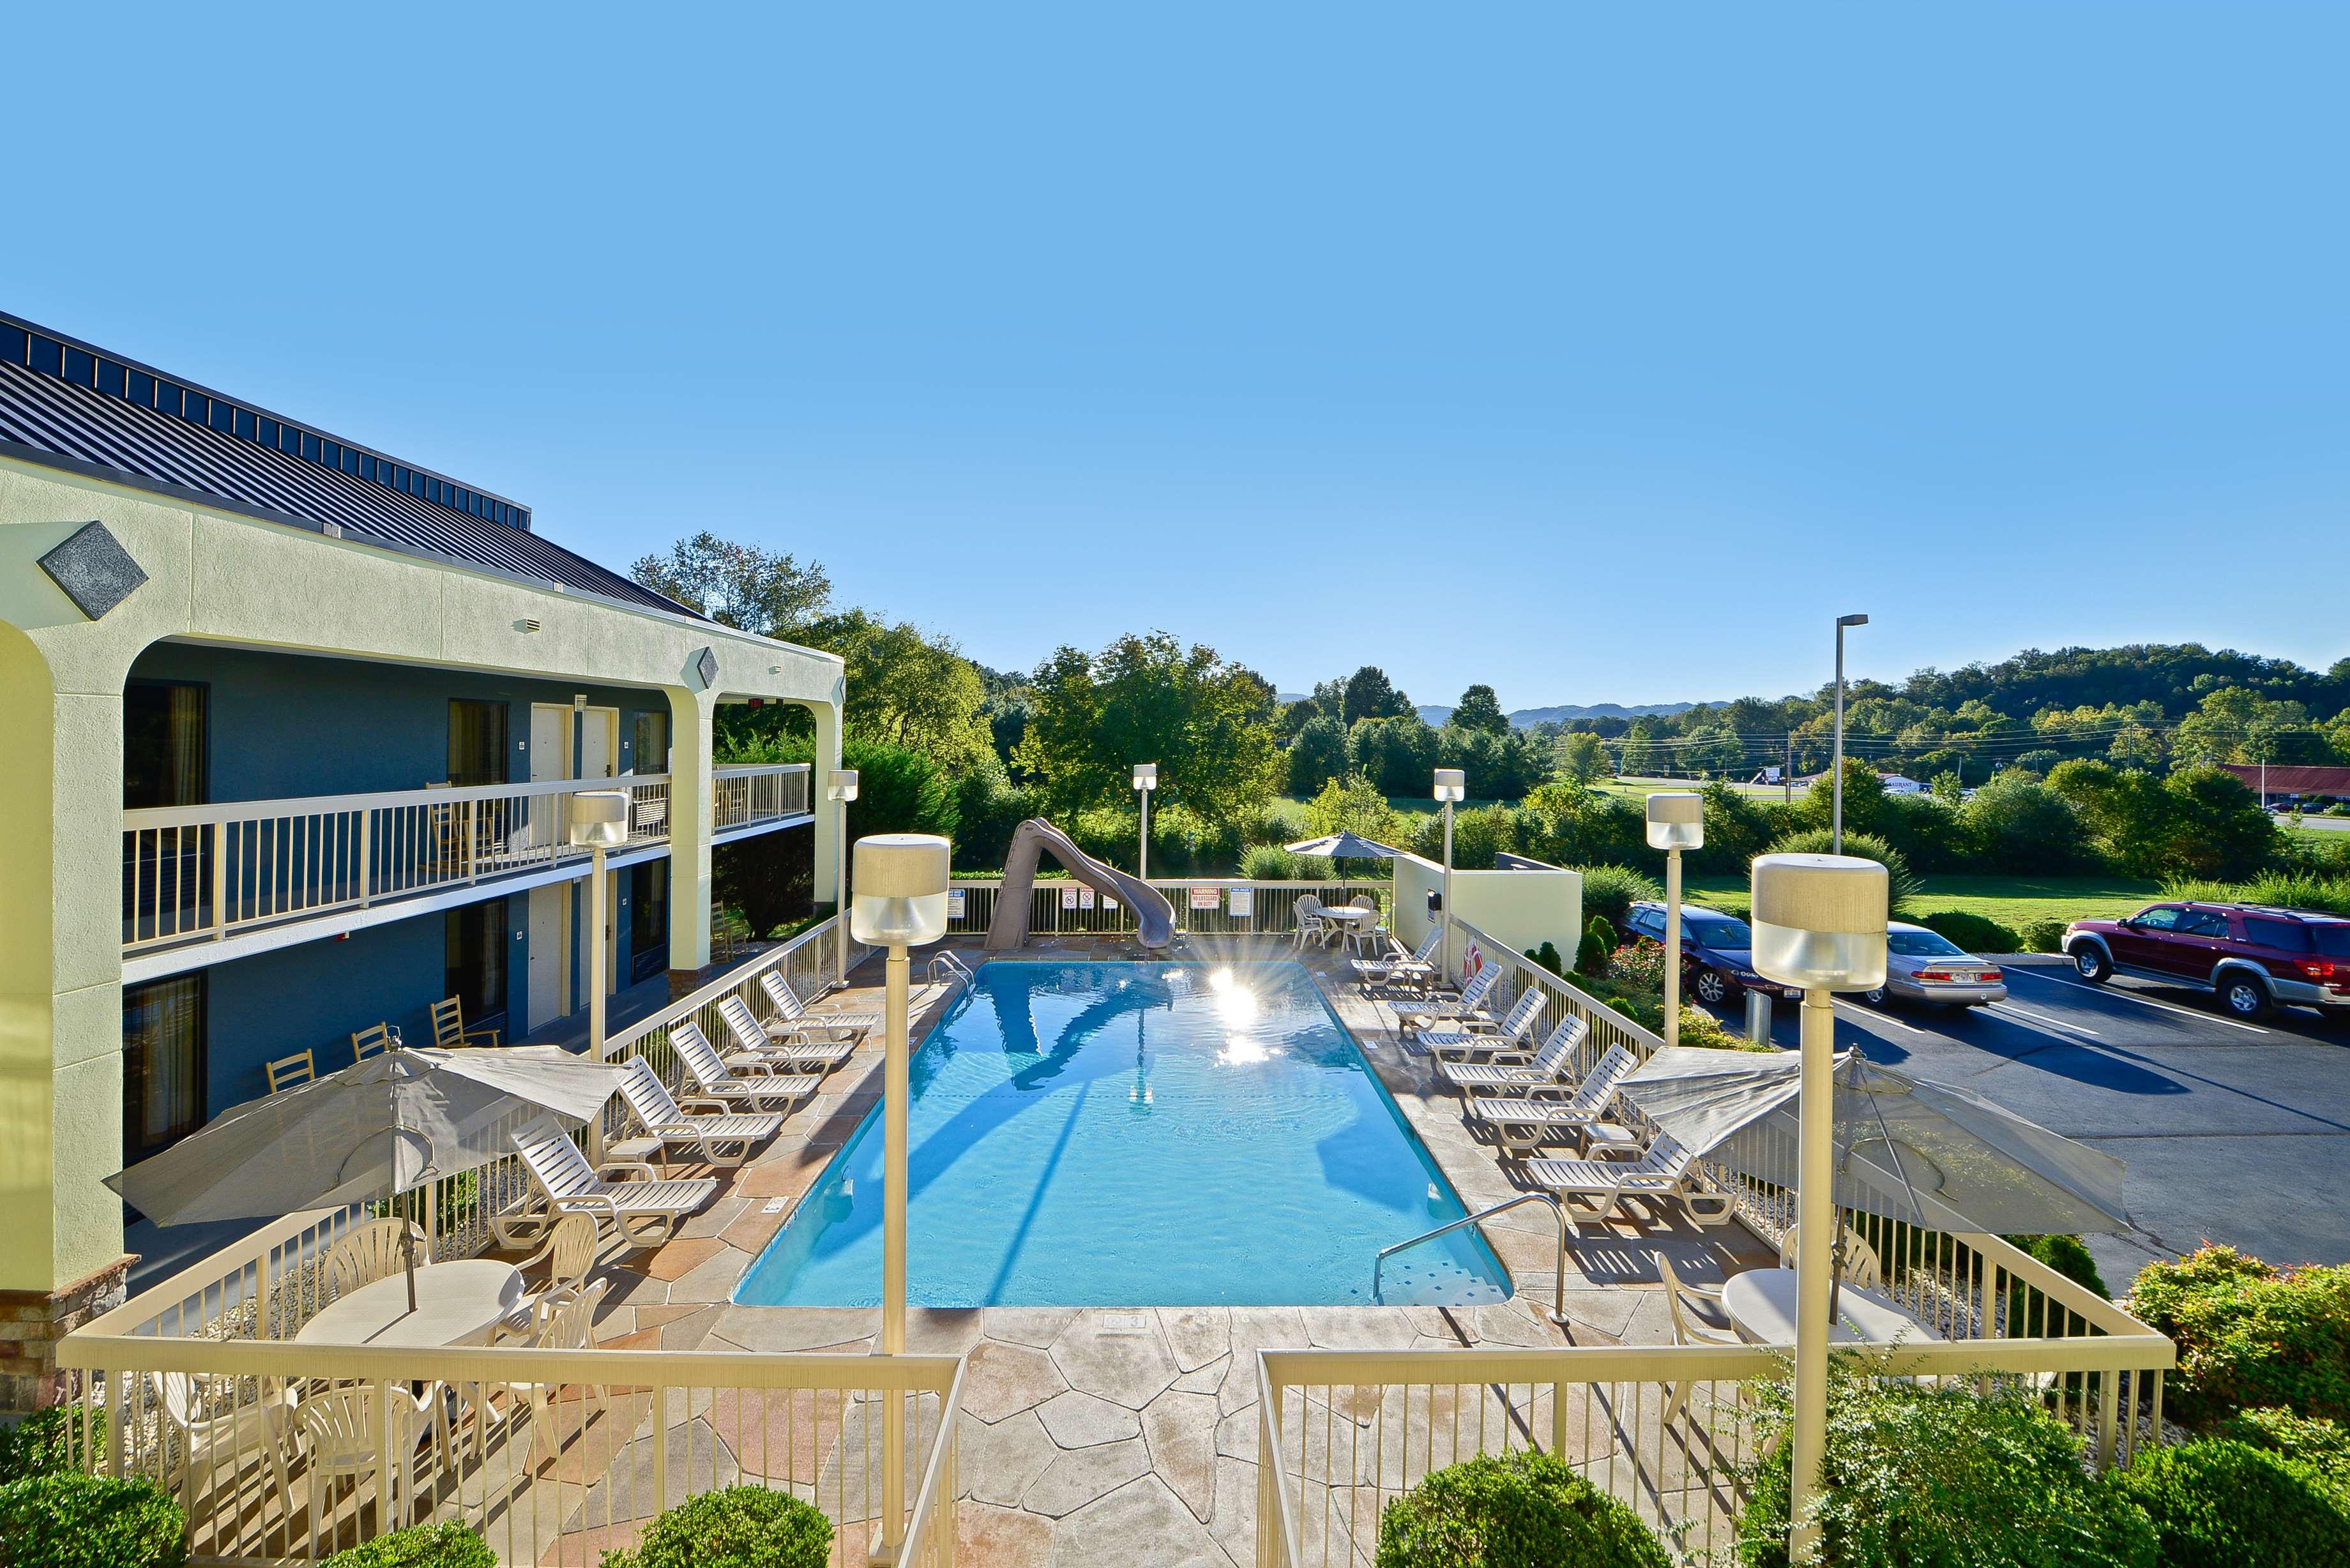 Best Western Cades Cove Inn image 16